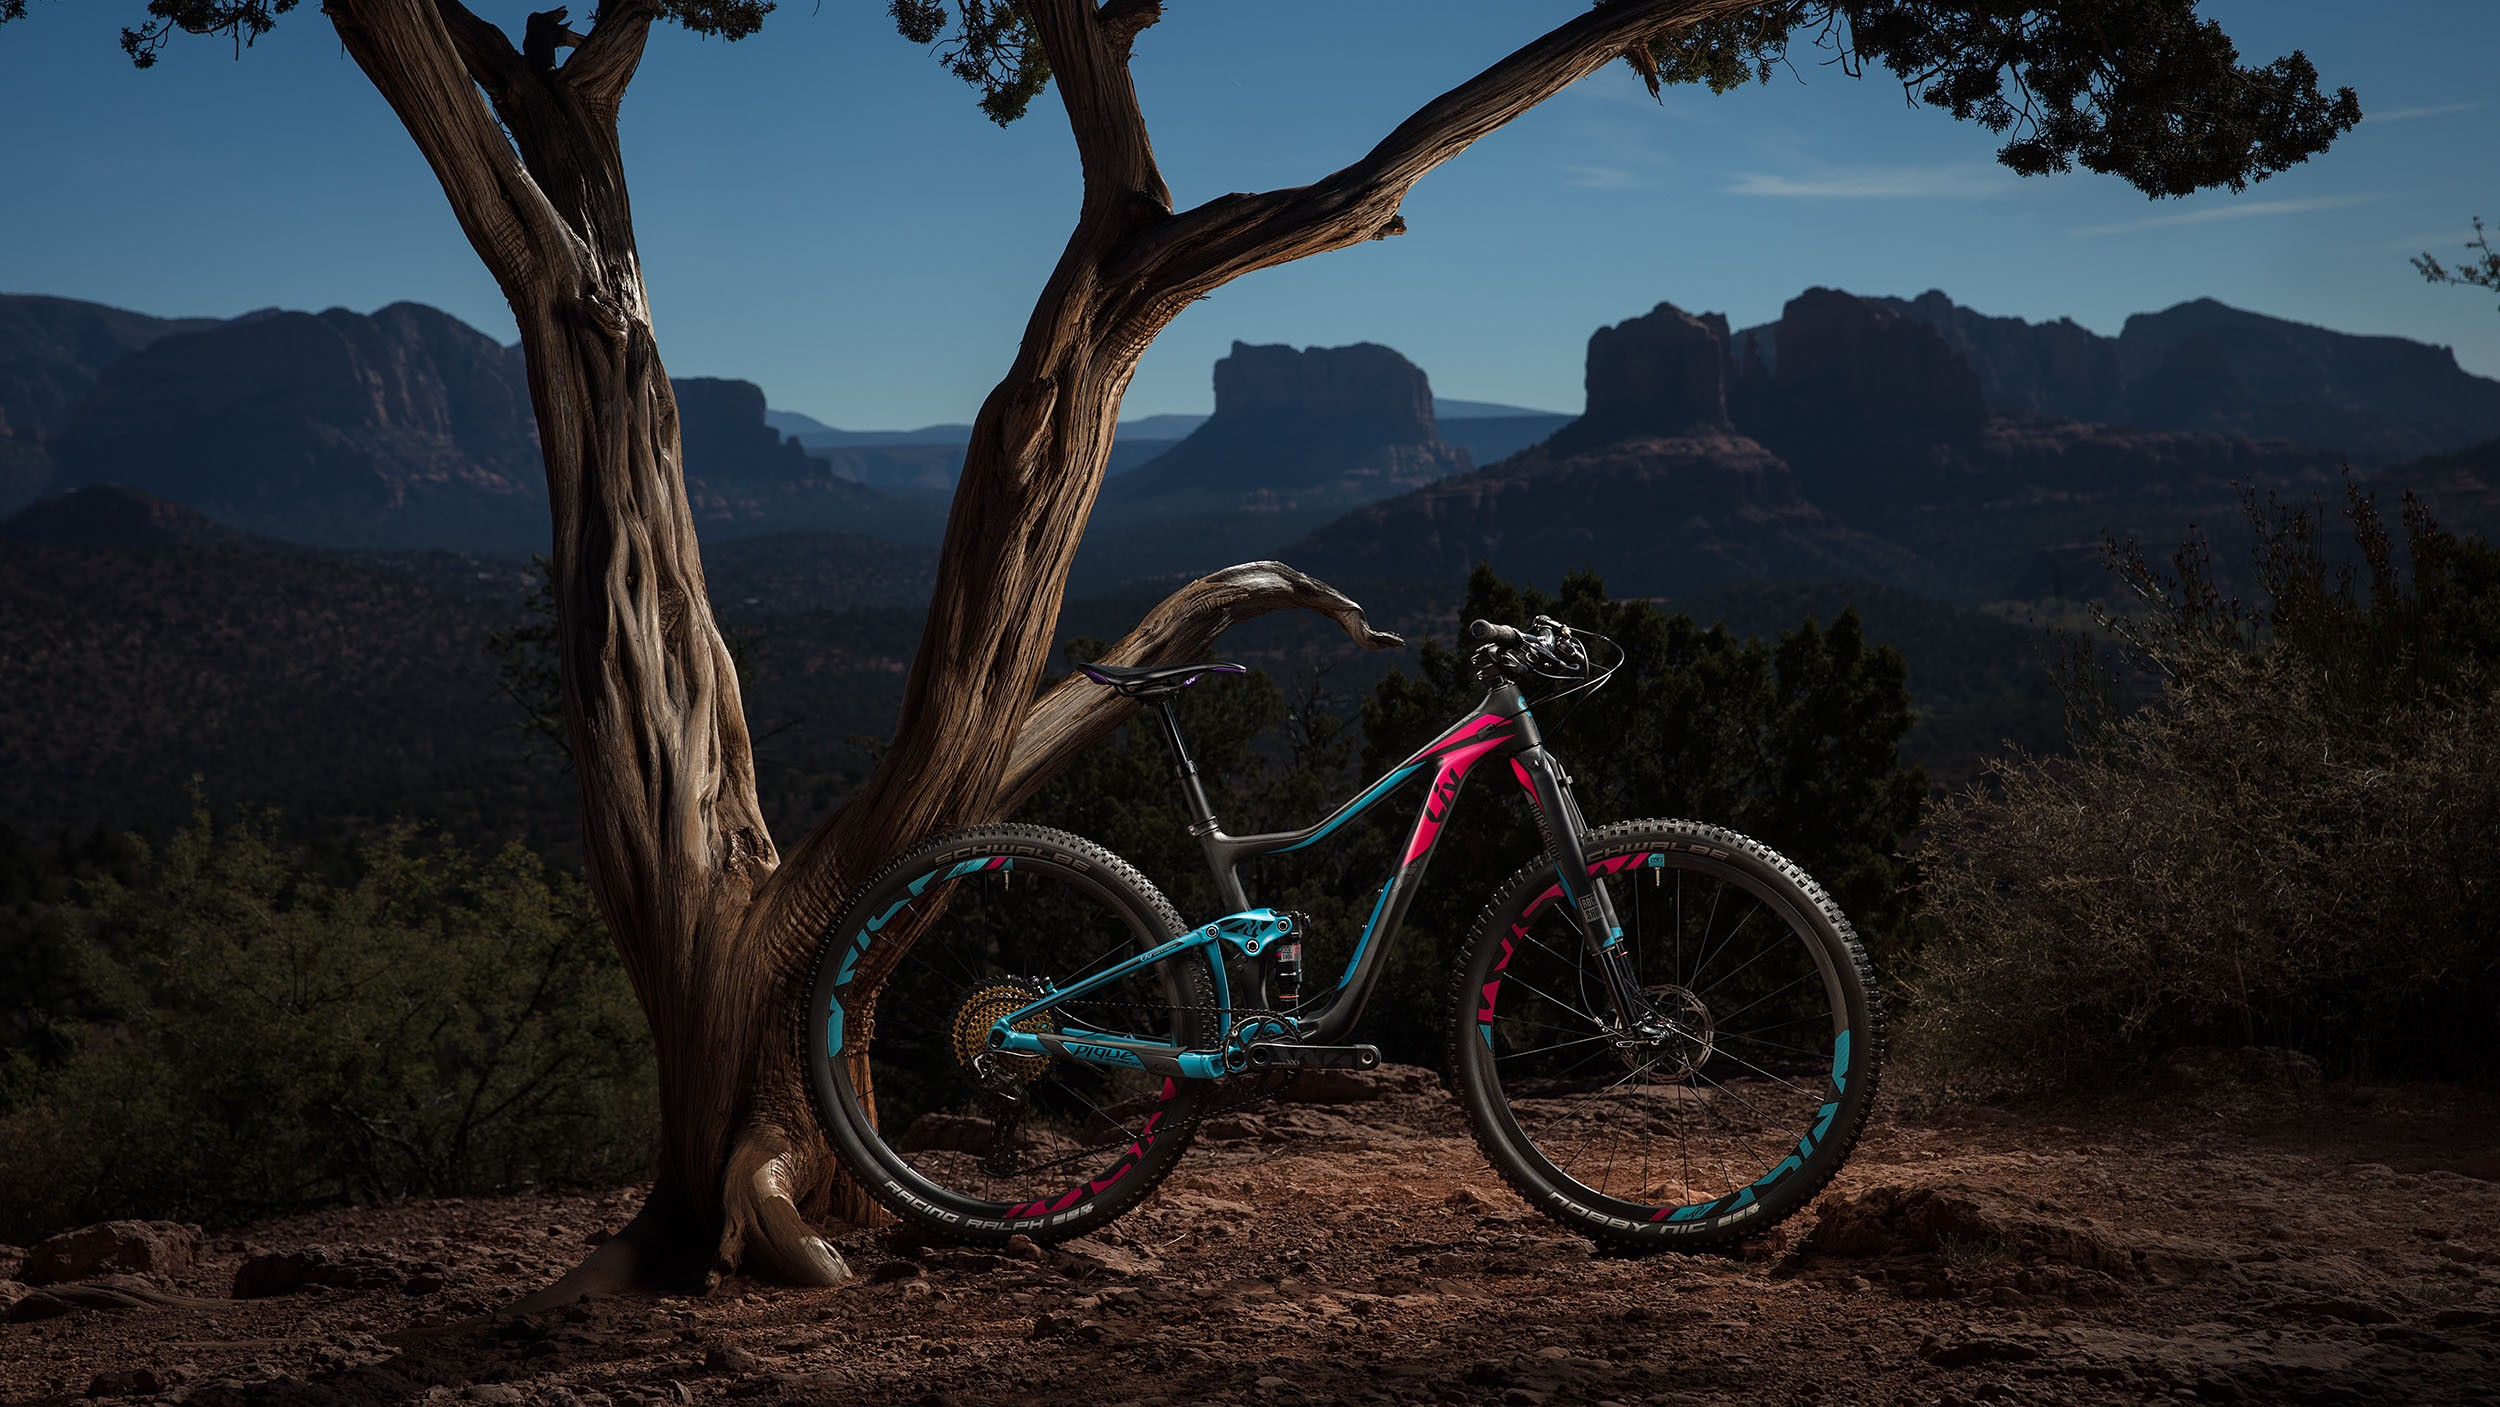 The 120mm-travel Liv Pique is an aggressive XC bike